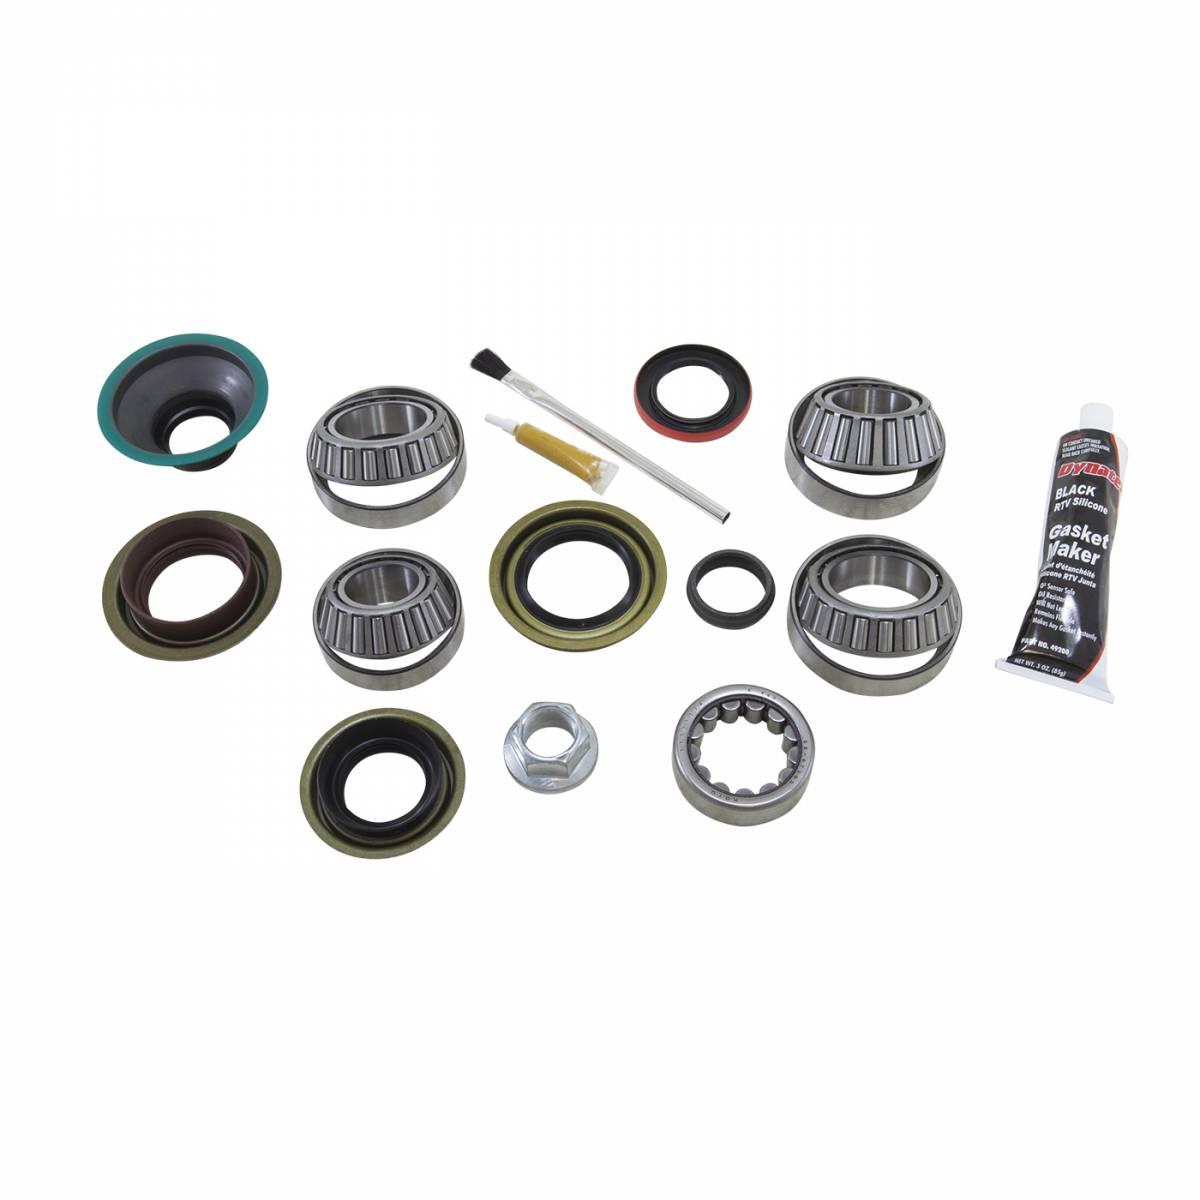 Yukon Gear Bk M35 Ifs Differential Bearing Kit